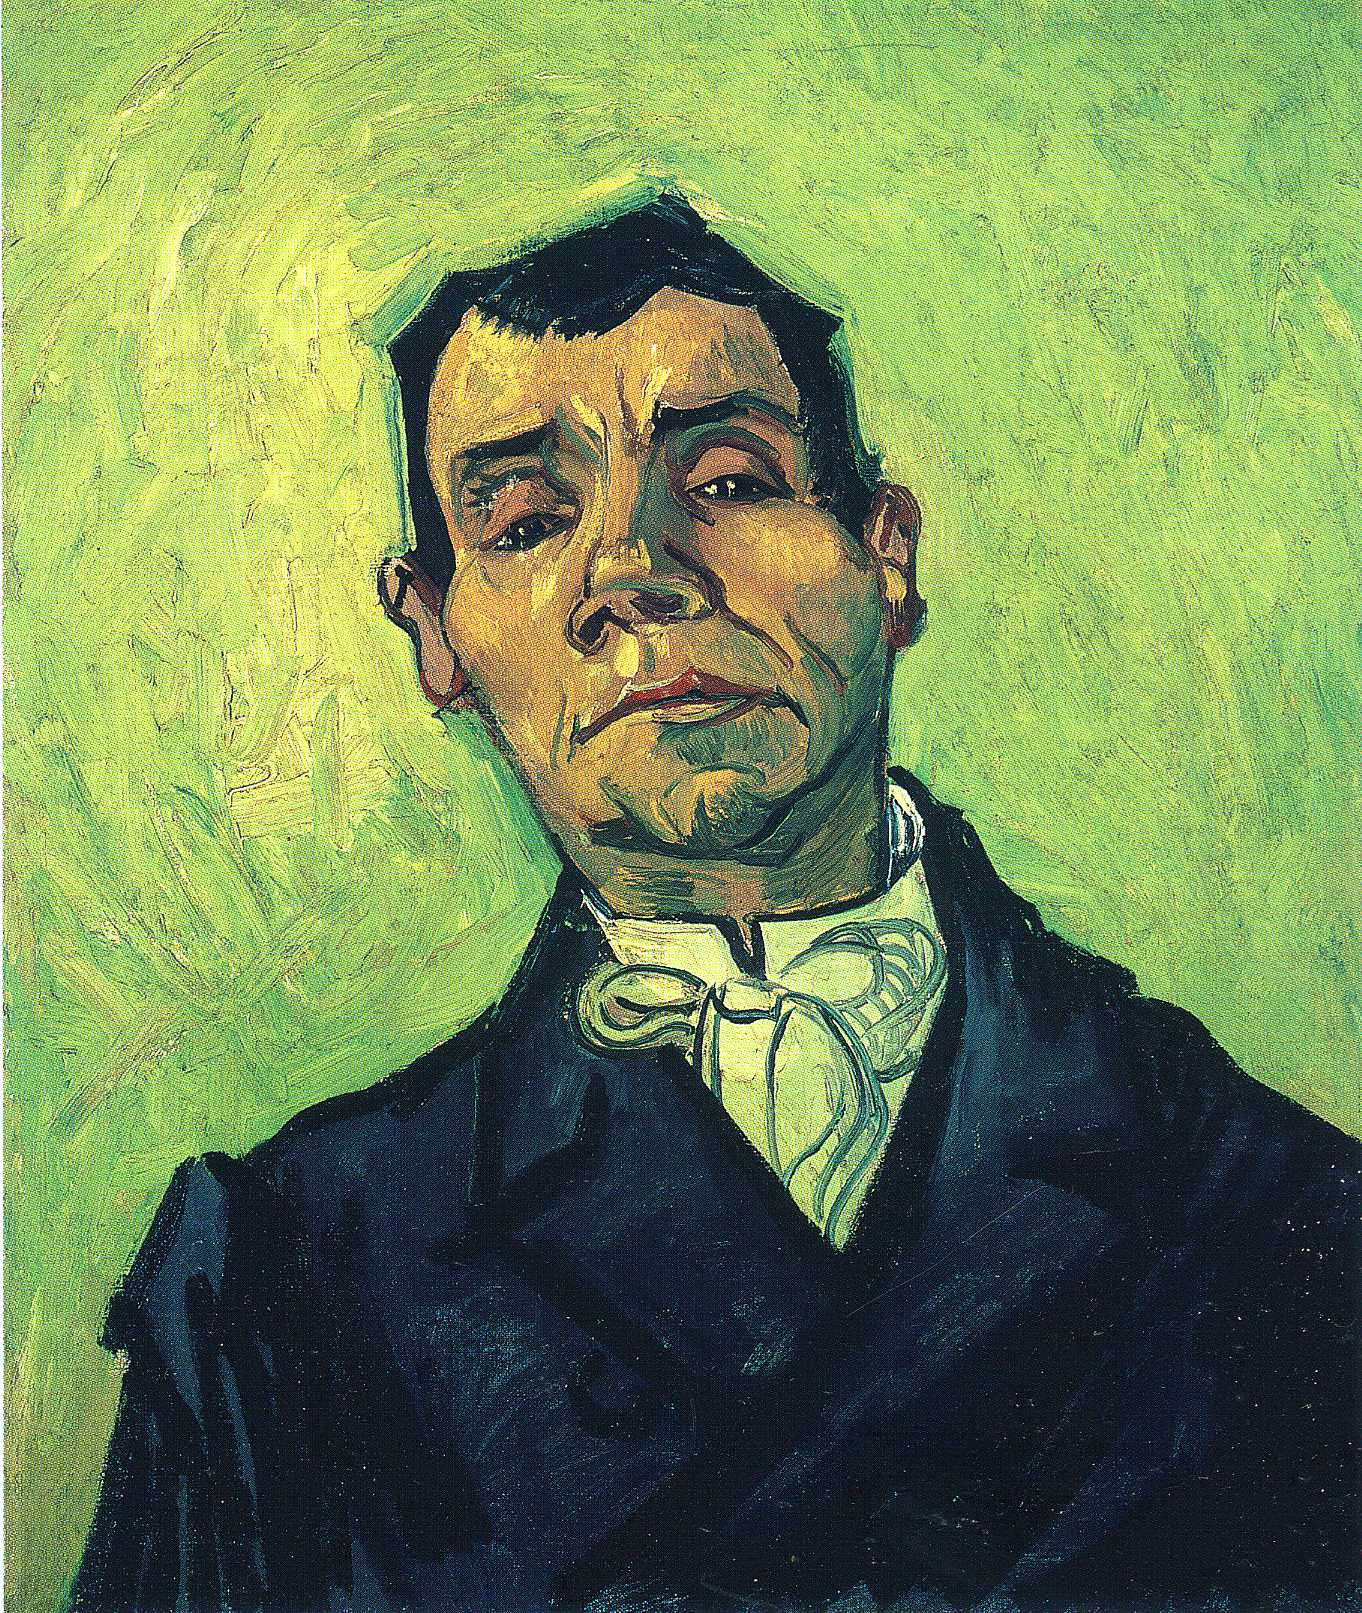 Portrait of a Man, 1888 - Vincent van Gogh - WikiArt.org